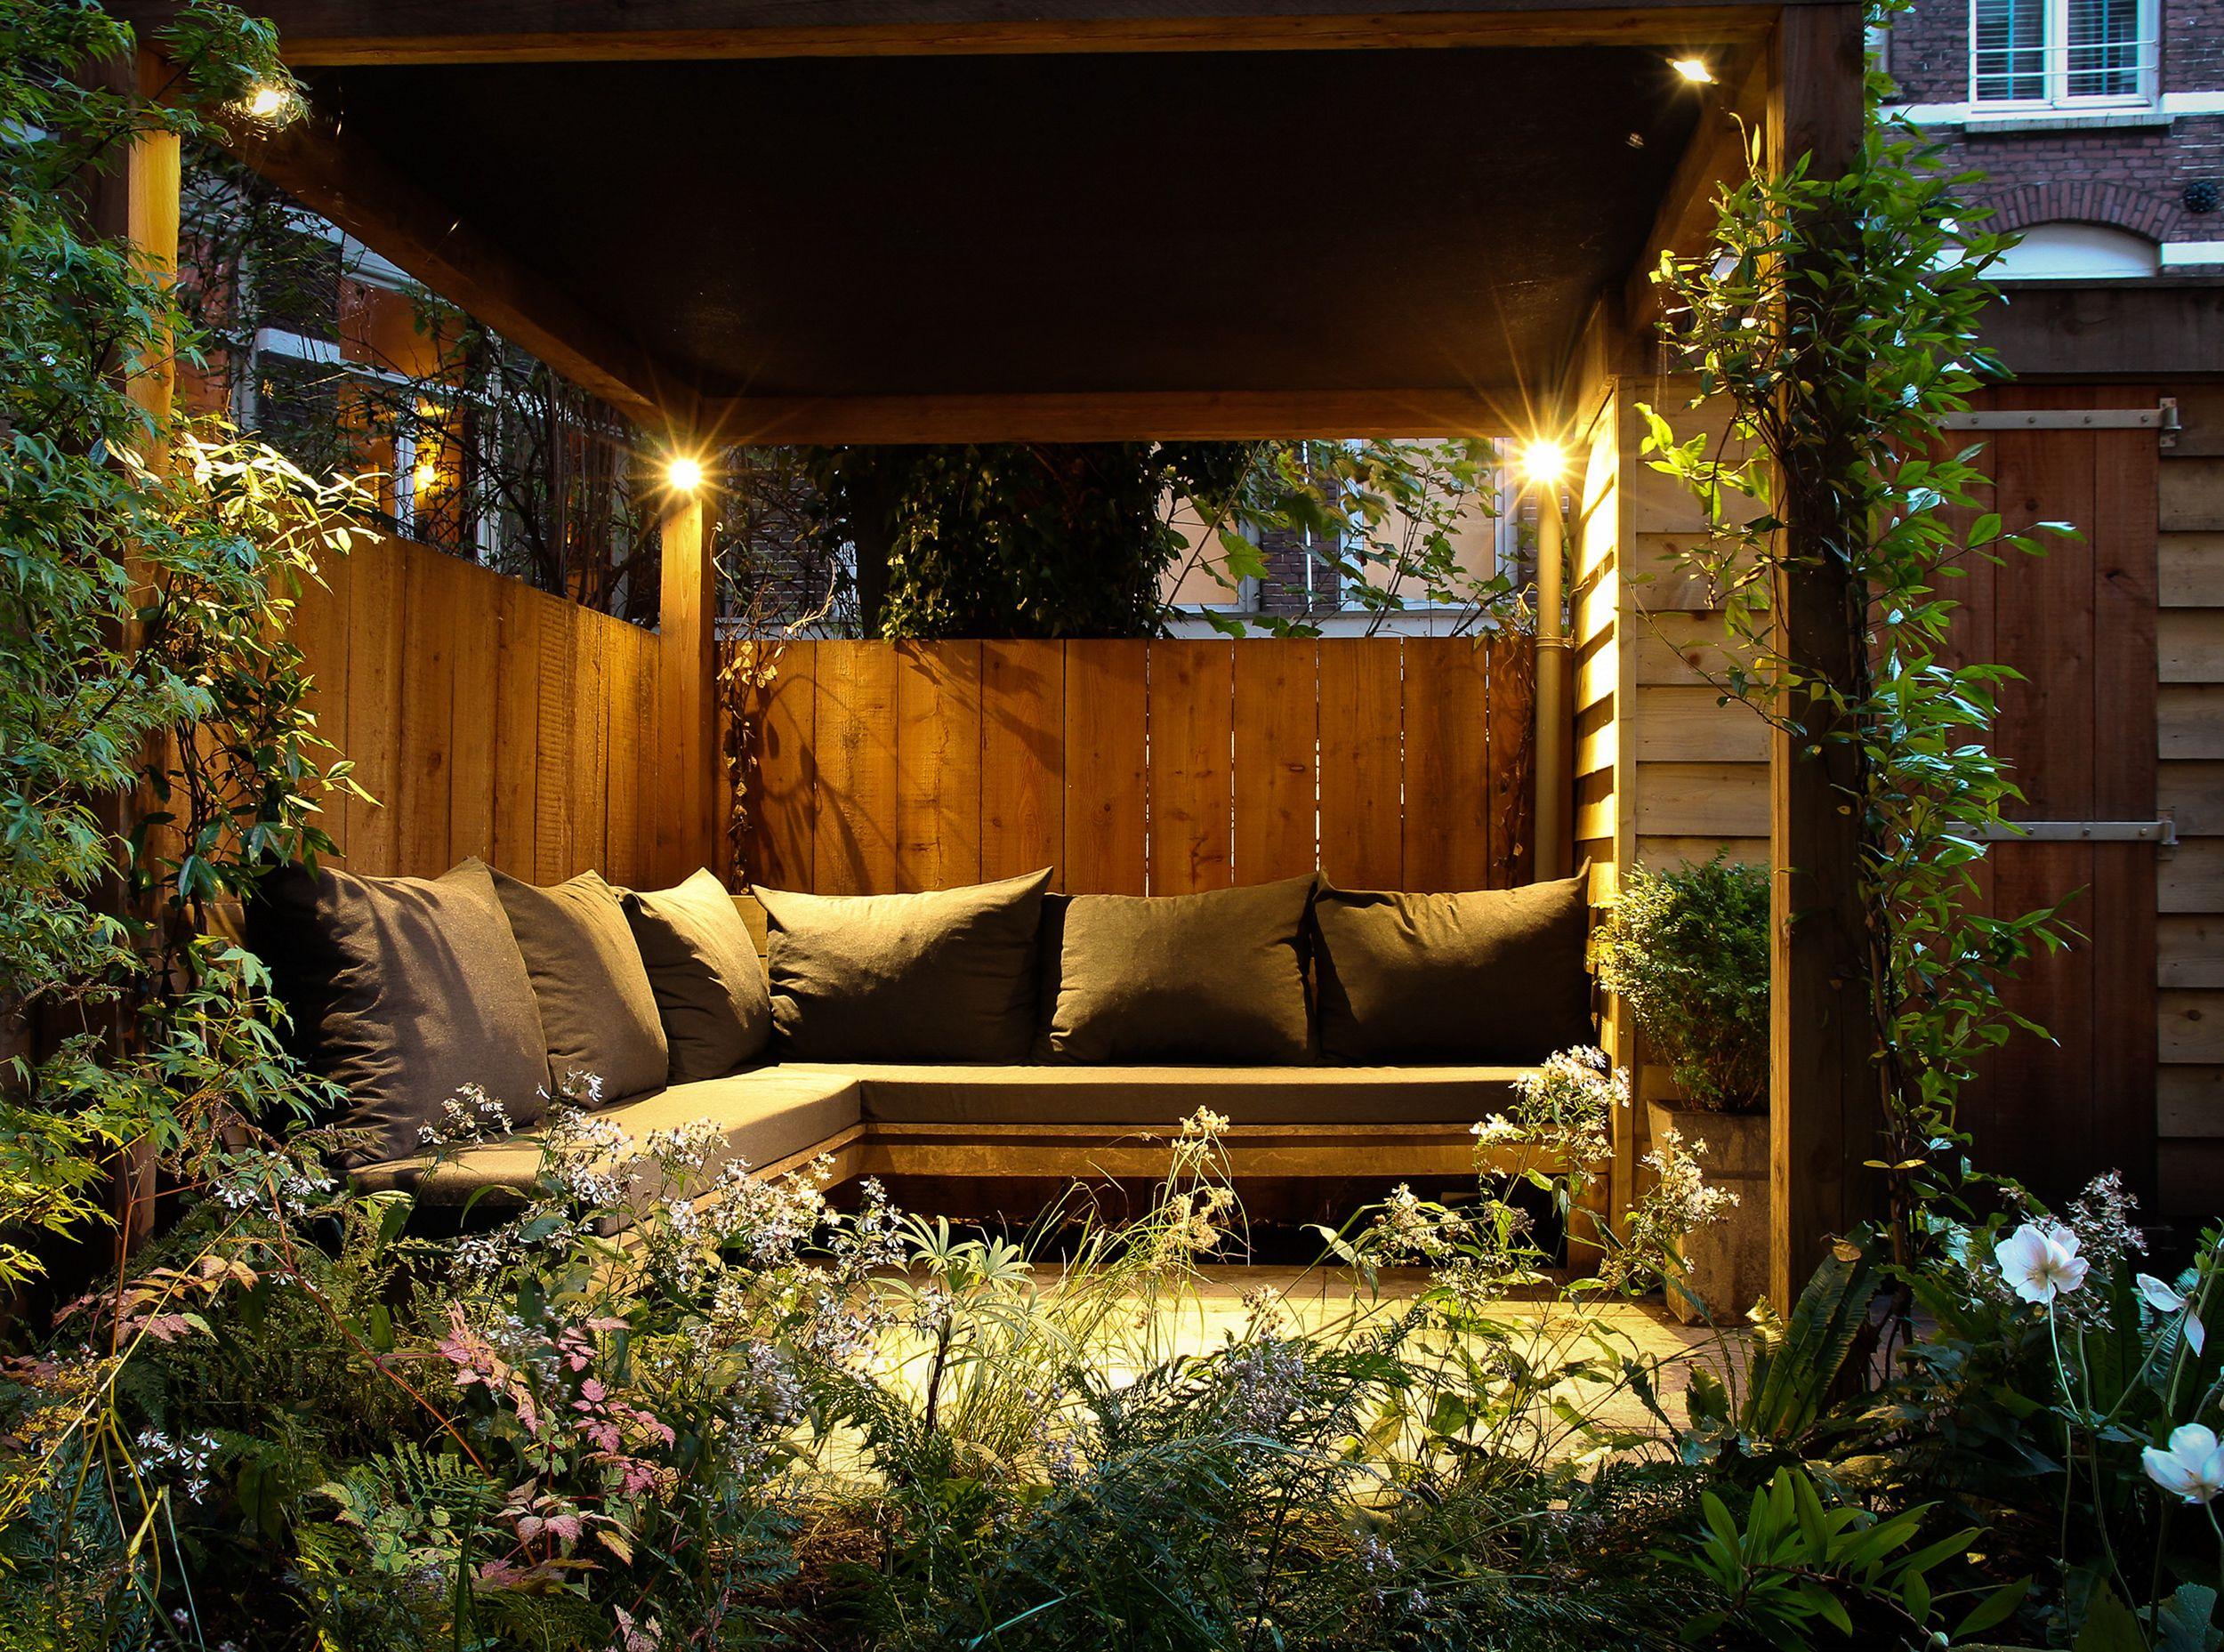 Garden Design Ideas With Seating Area 25